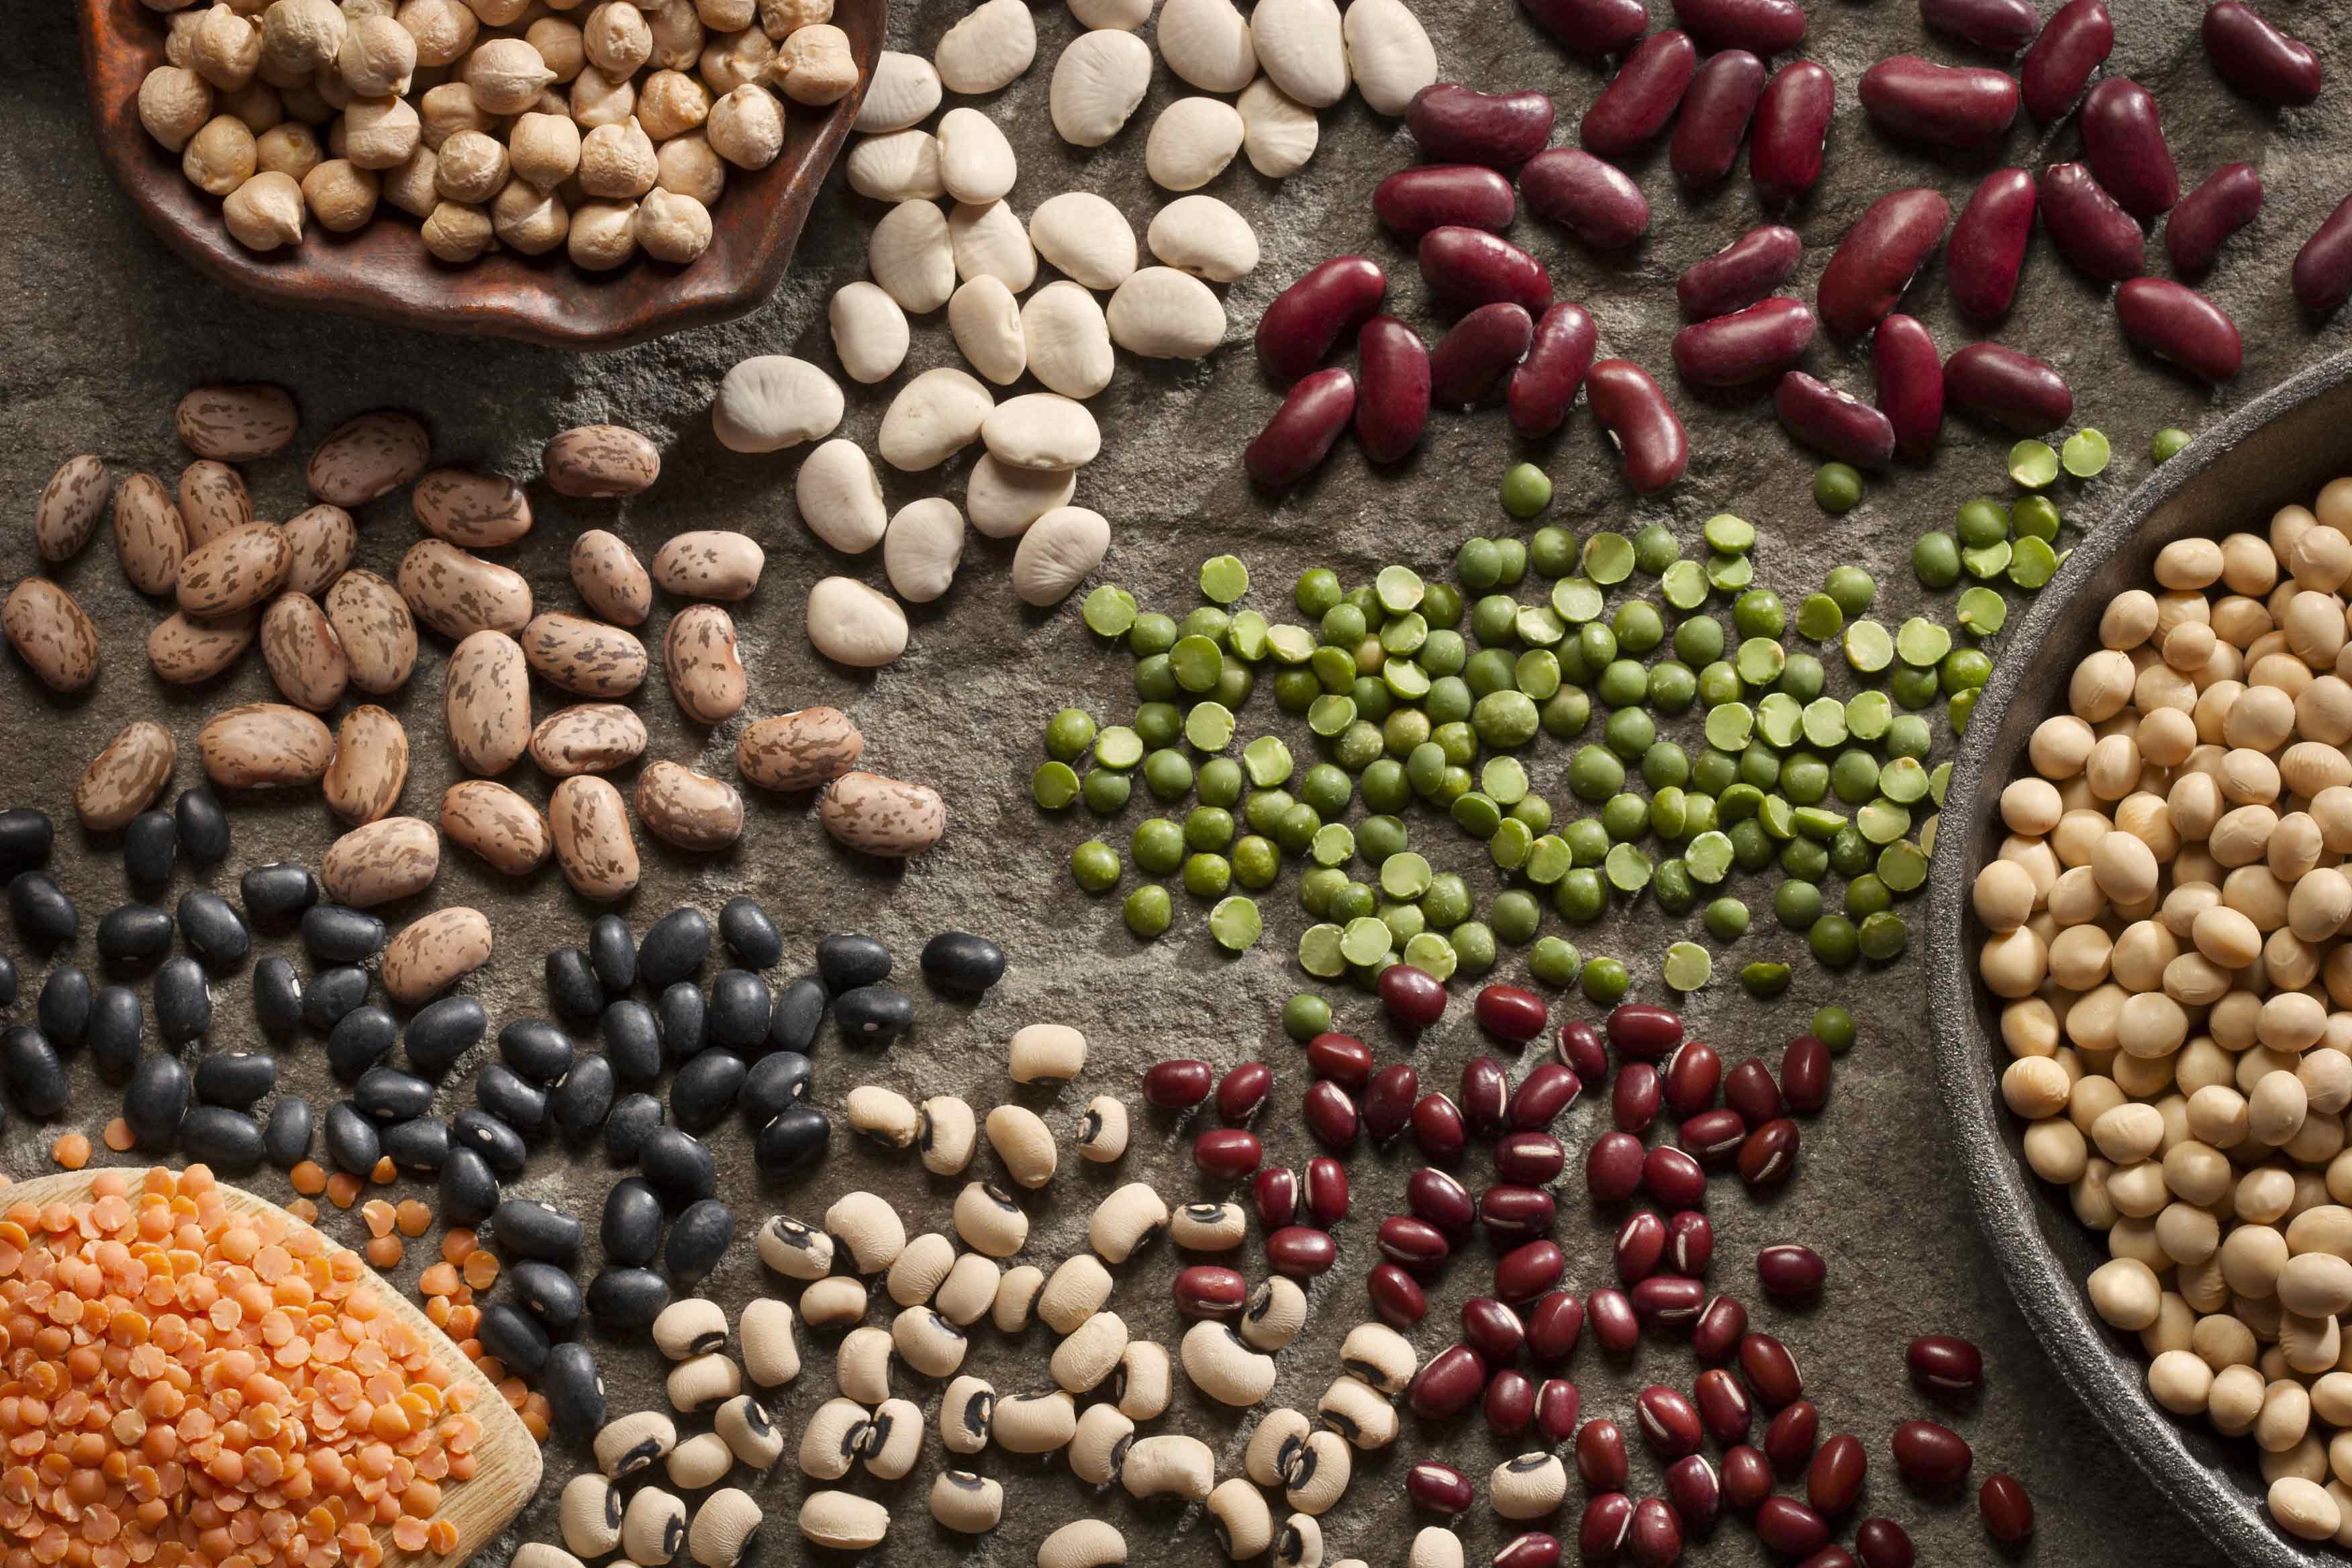 Top heart healthy foods: Beans